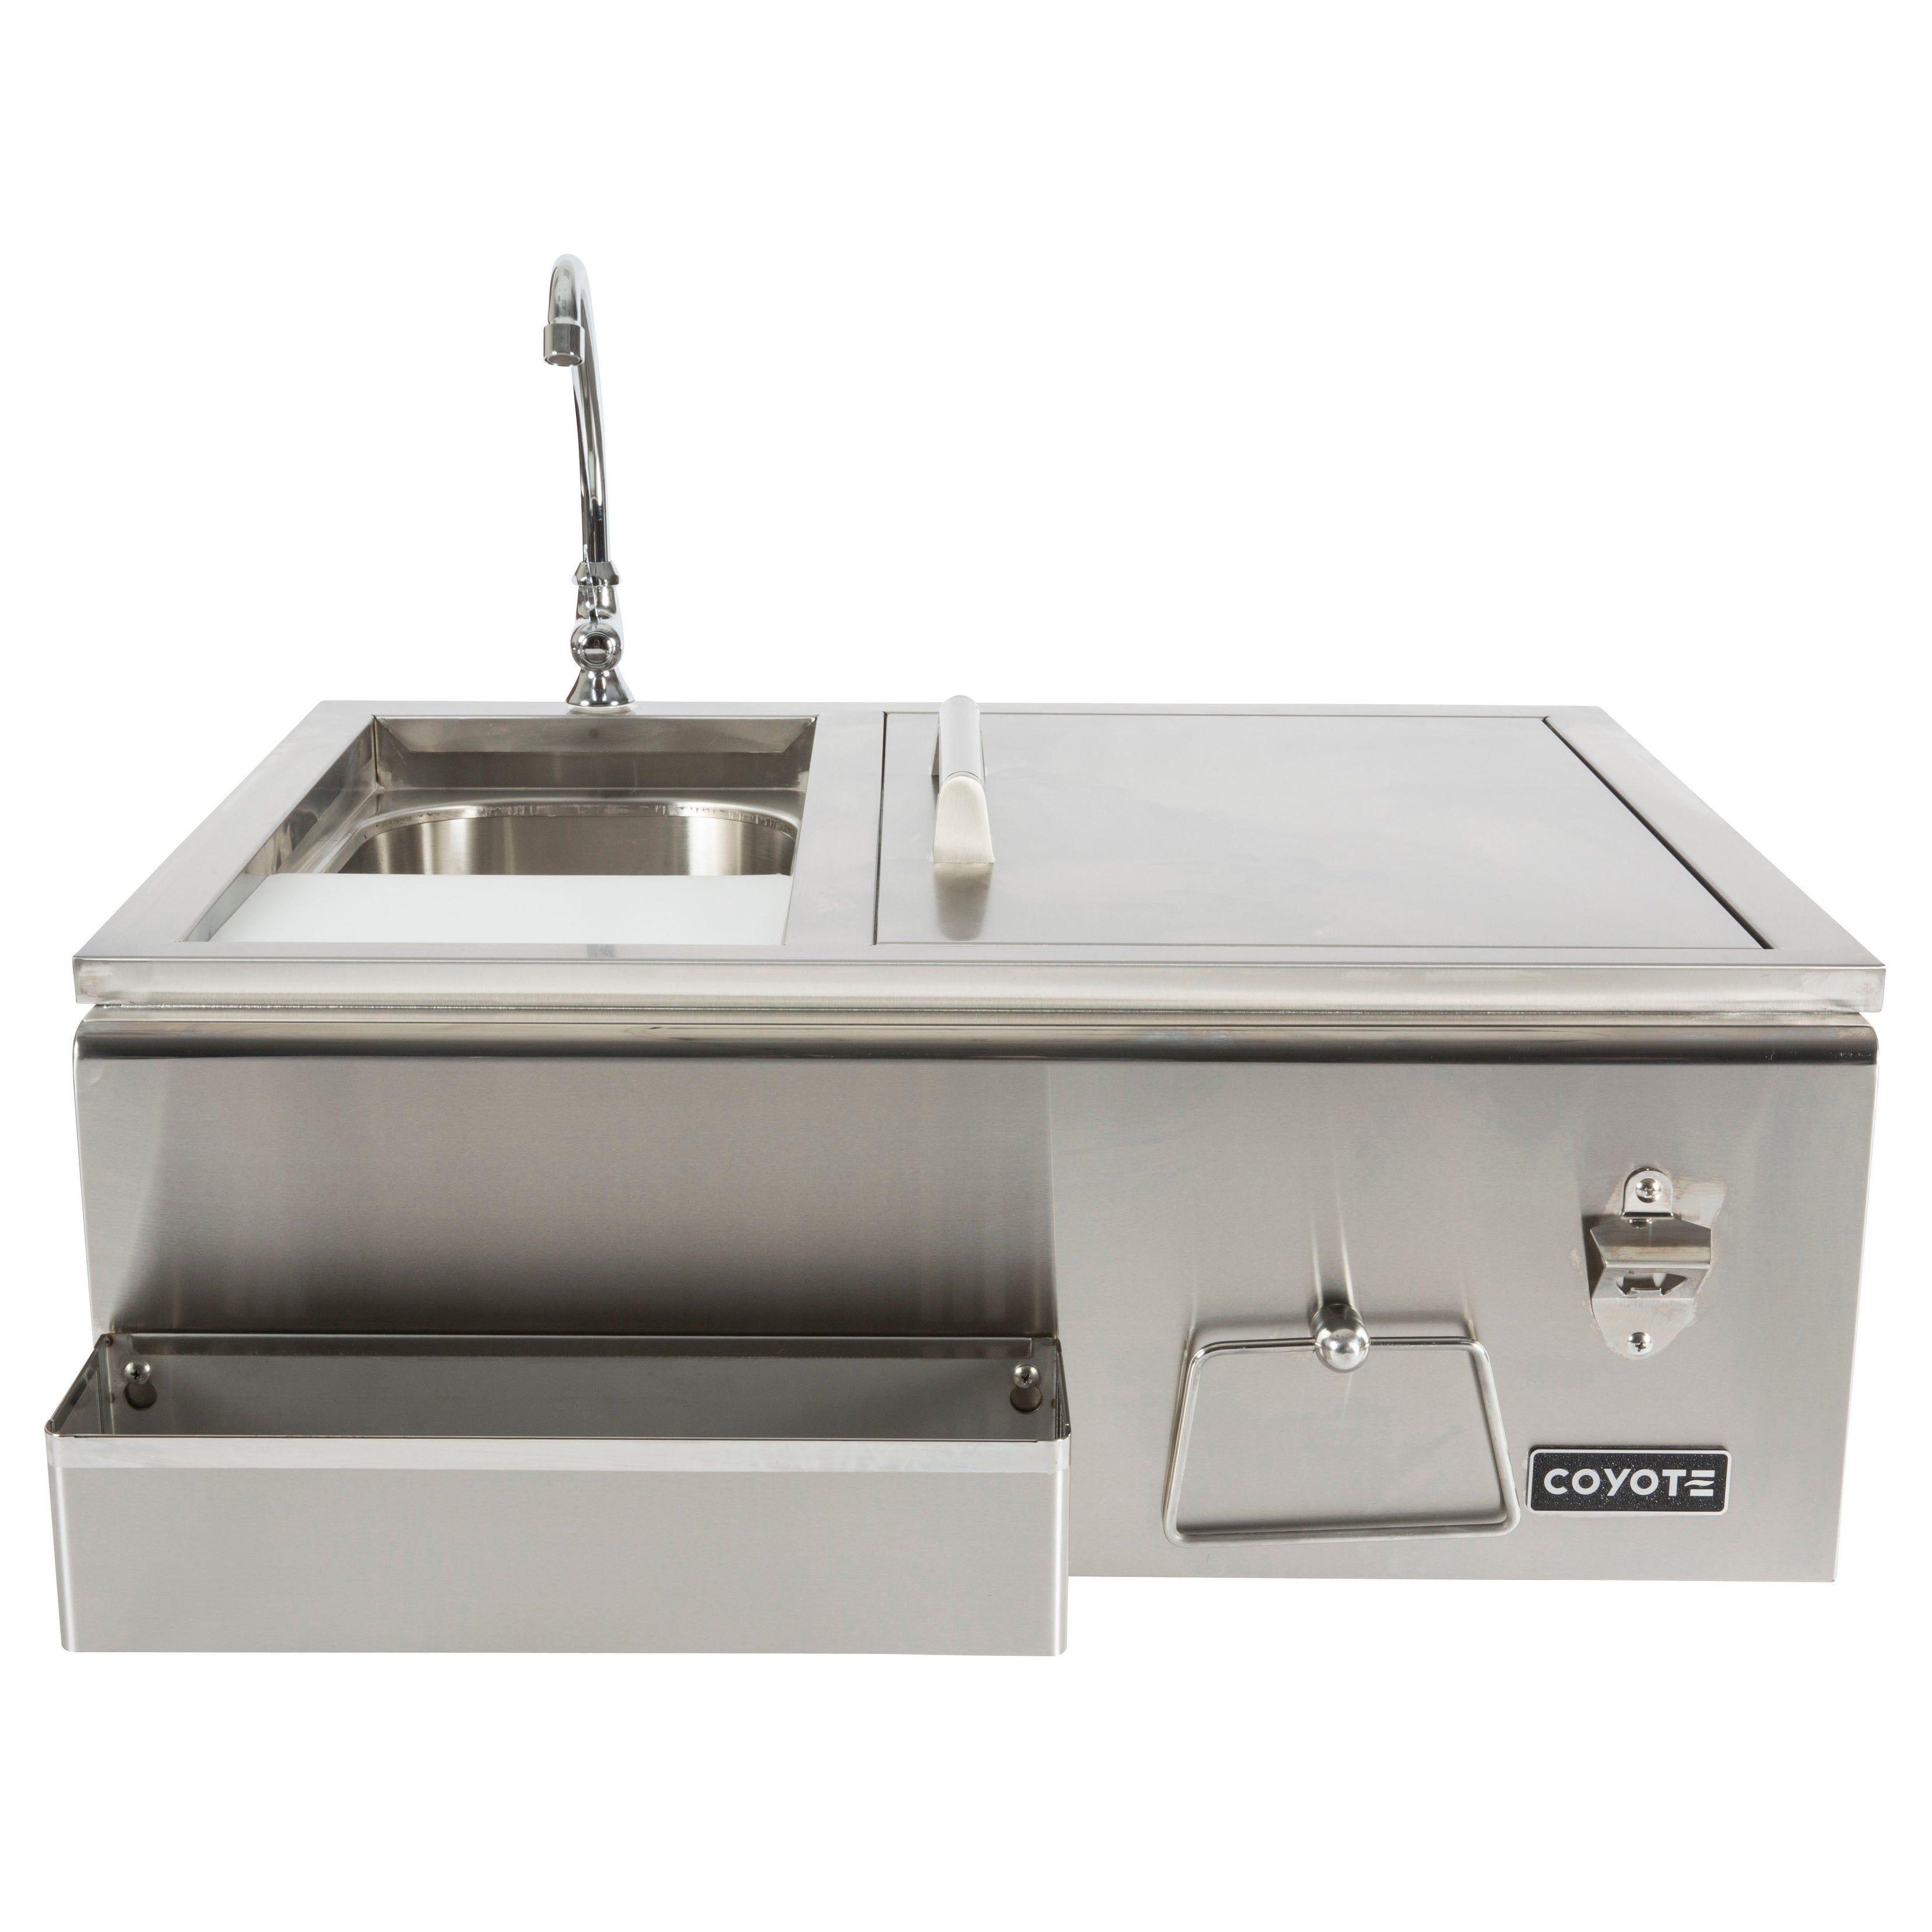 Refreshment Center Sink Faucet Drop In Cooler Stainless Steel Outdoor Sinks Sink Outdoor Refrigerator